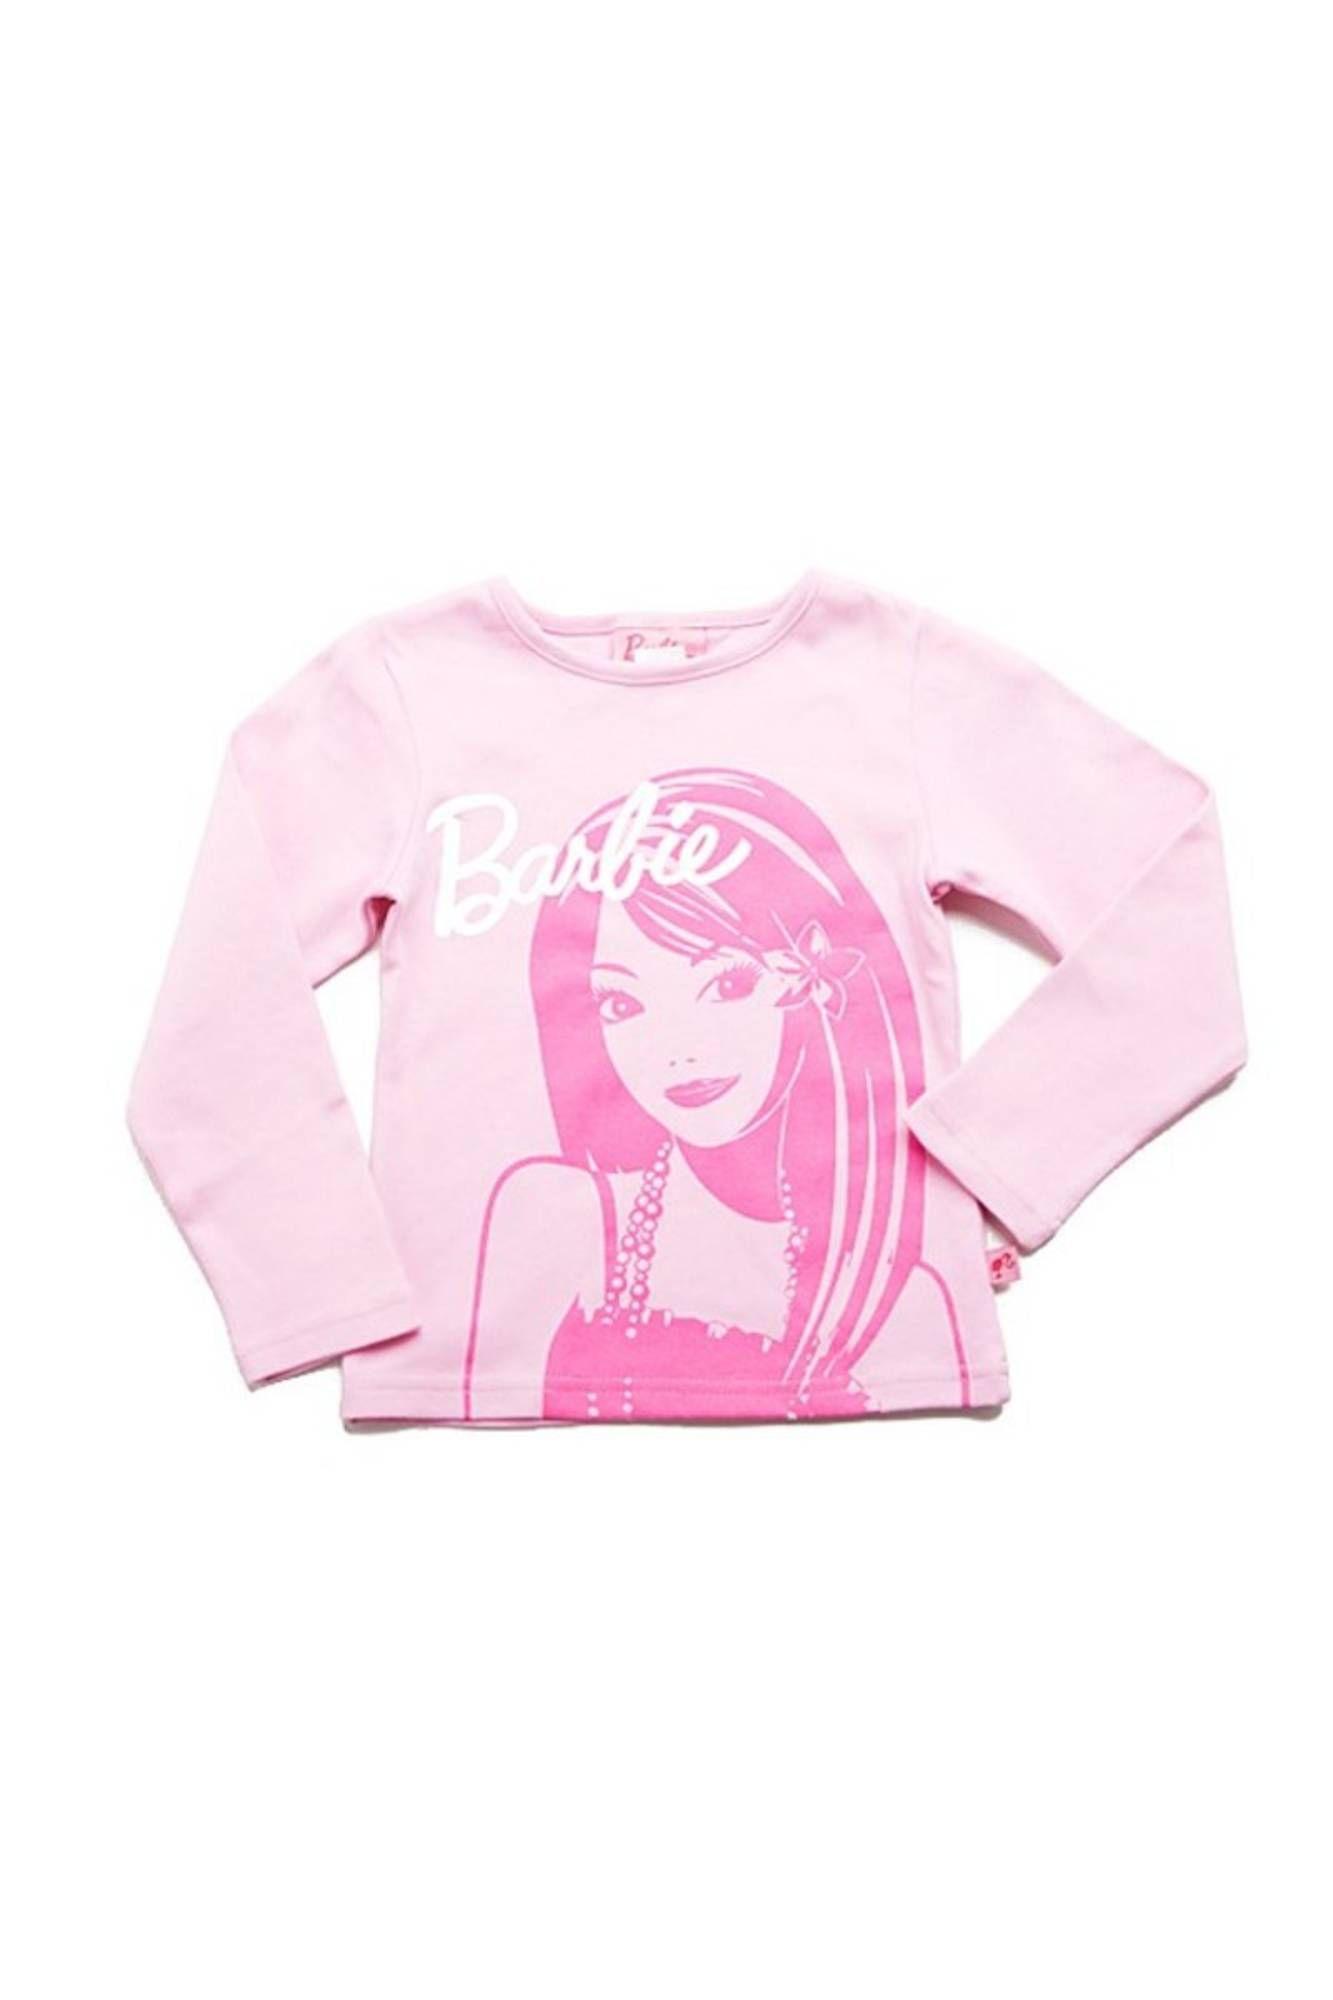 BARBIE T-shirt long sleeves ROSA